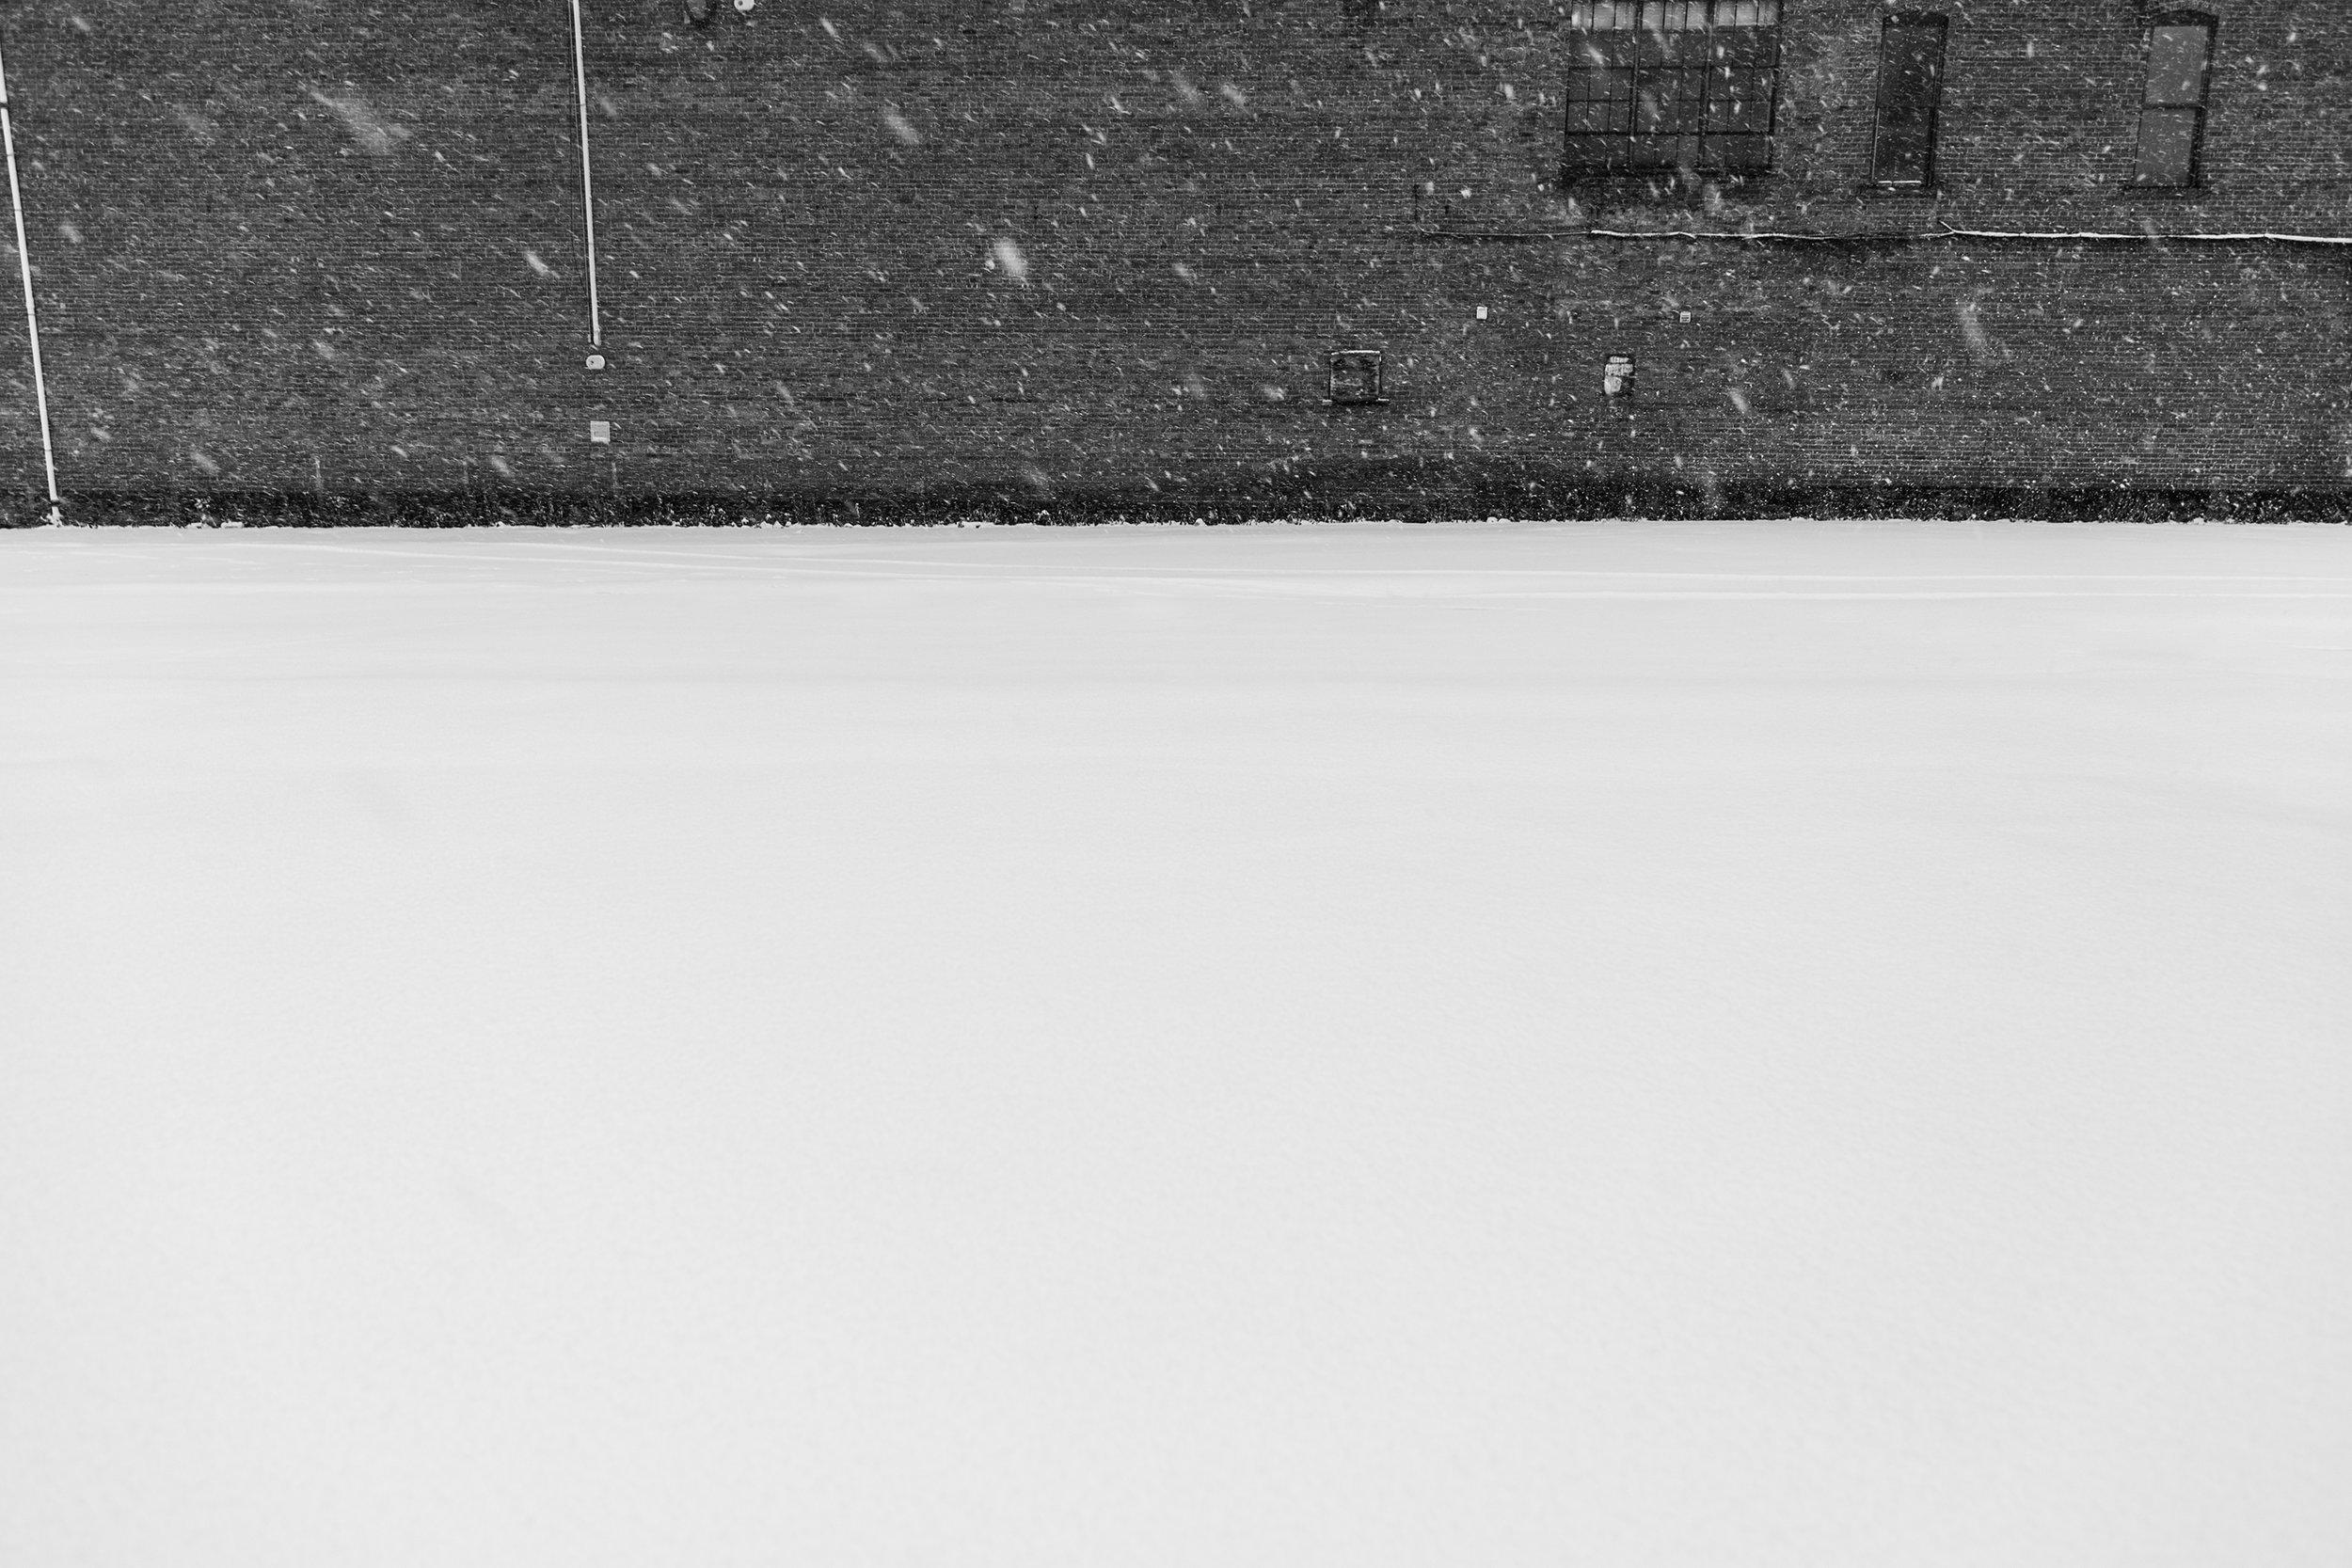 Snowy Ground Cover (web).jpg